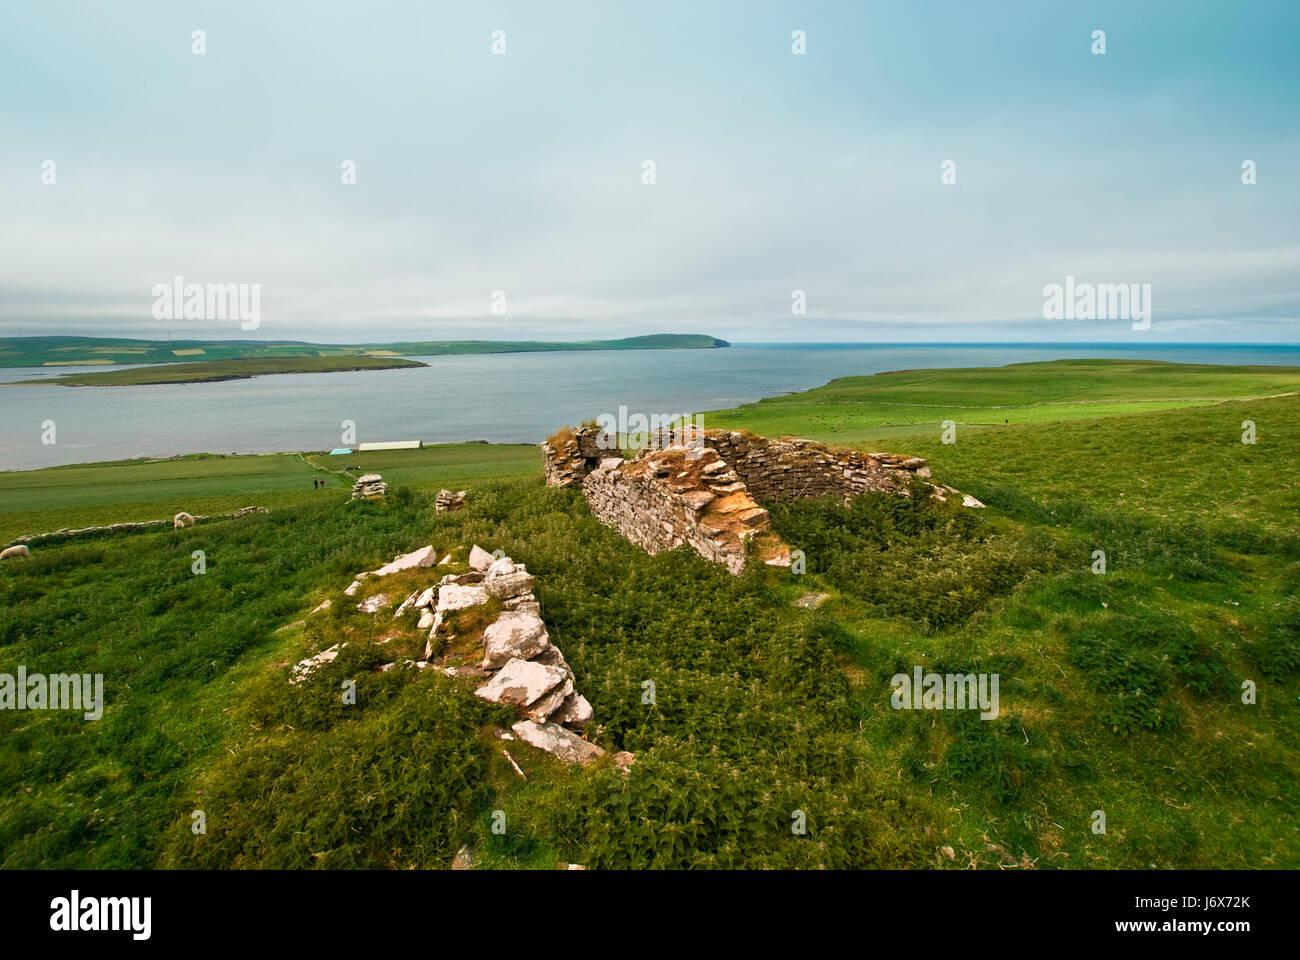 scotland island britain firmament sky salt water sea ocean water isle travel - Stock Image